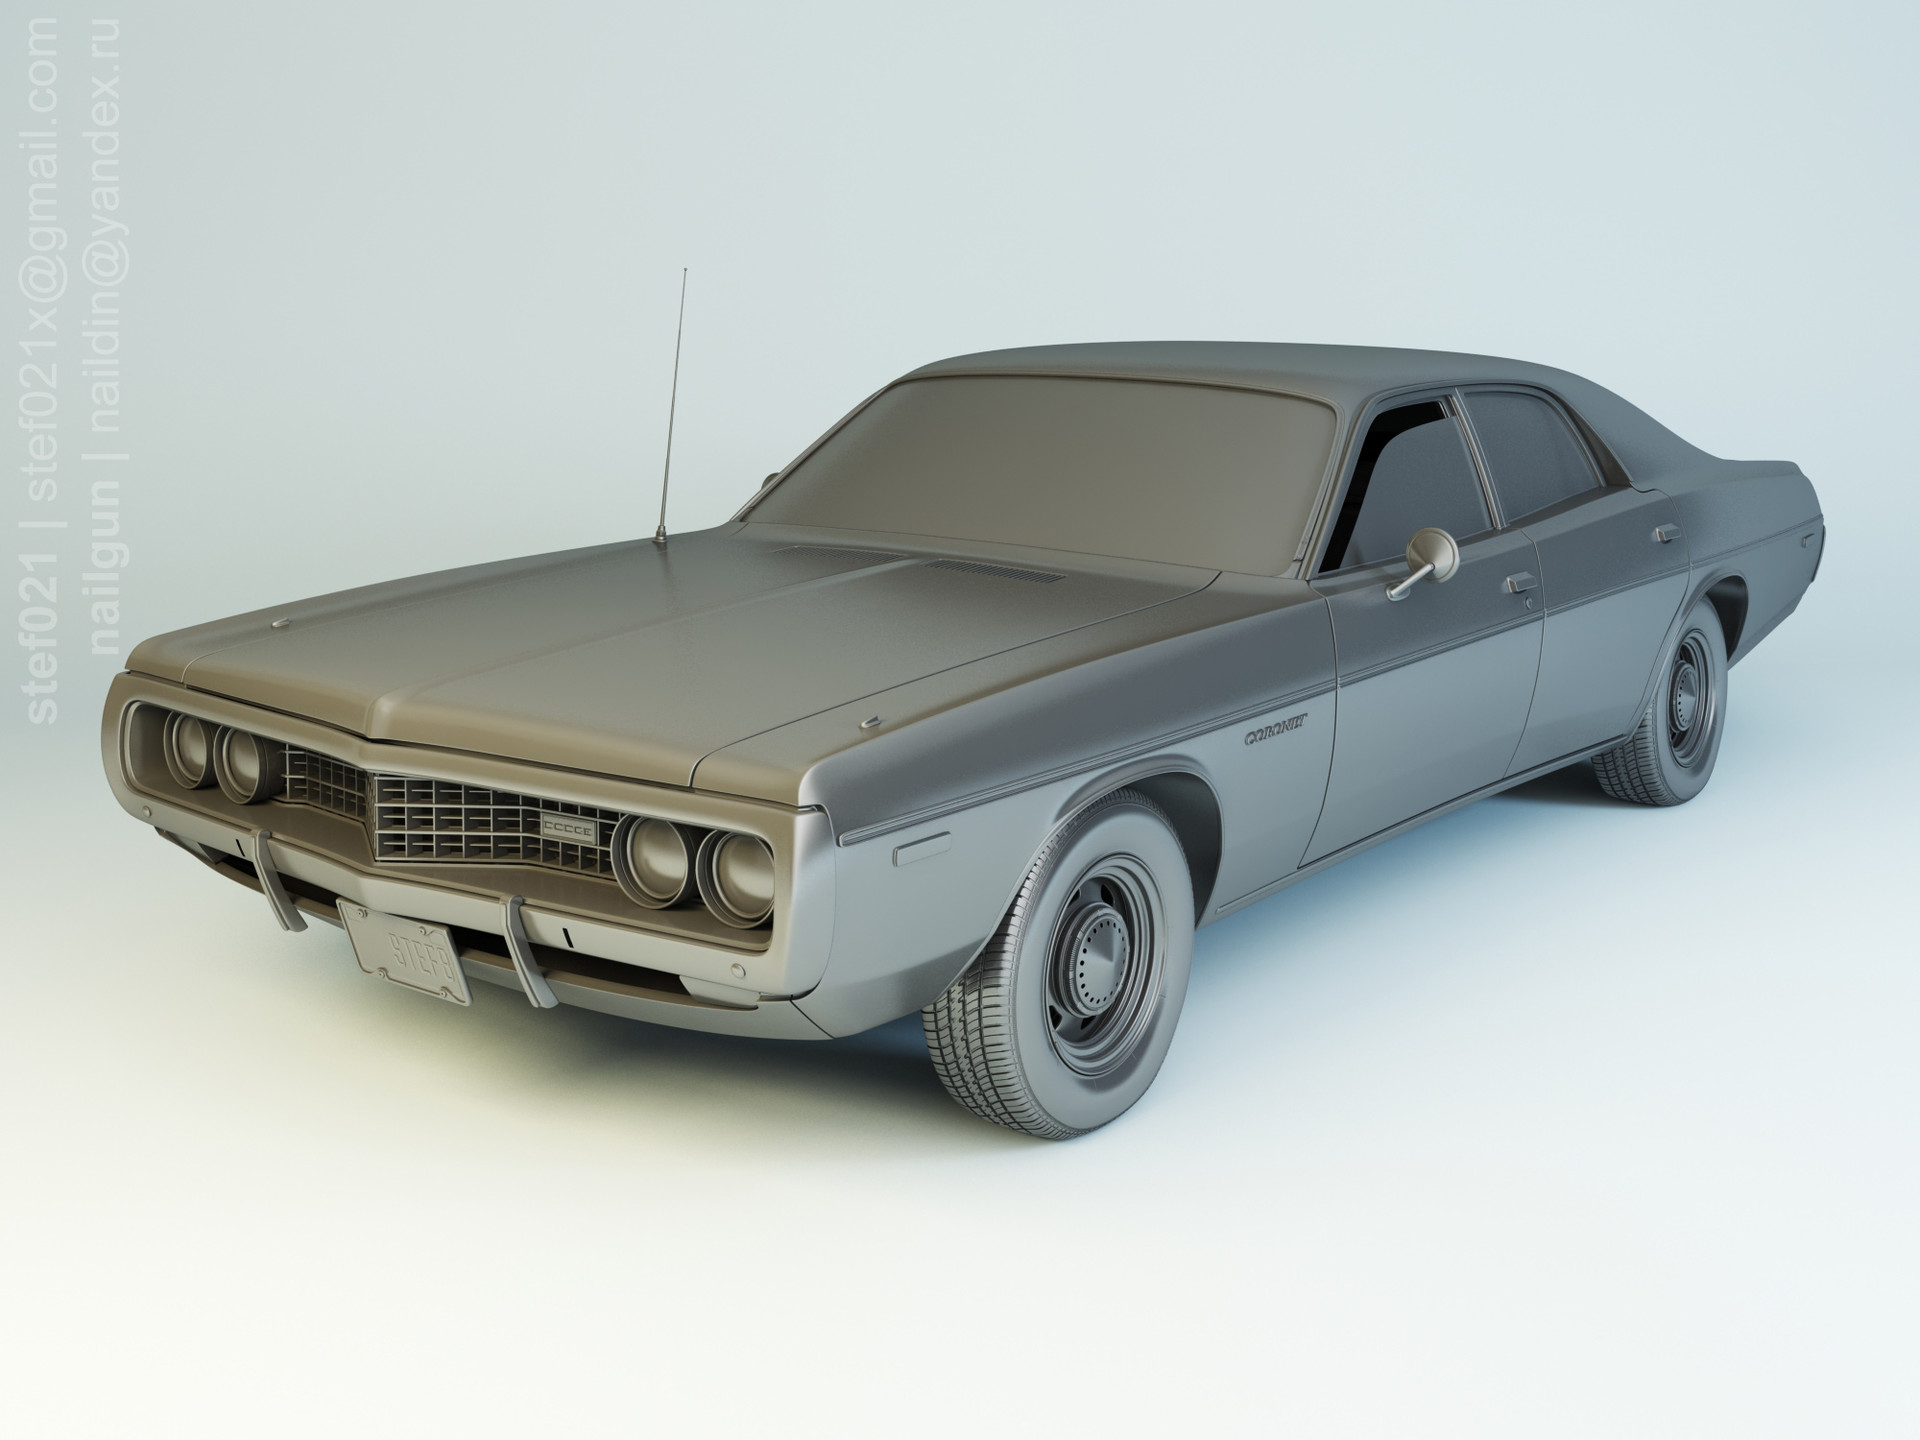 Nail khusnutdinov pwc 053 001 dodge coronet 1973 modelling 0